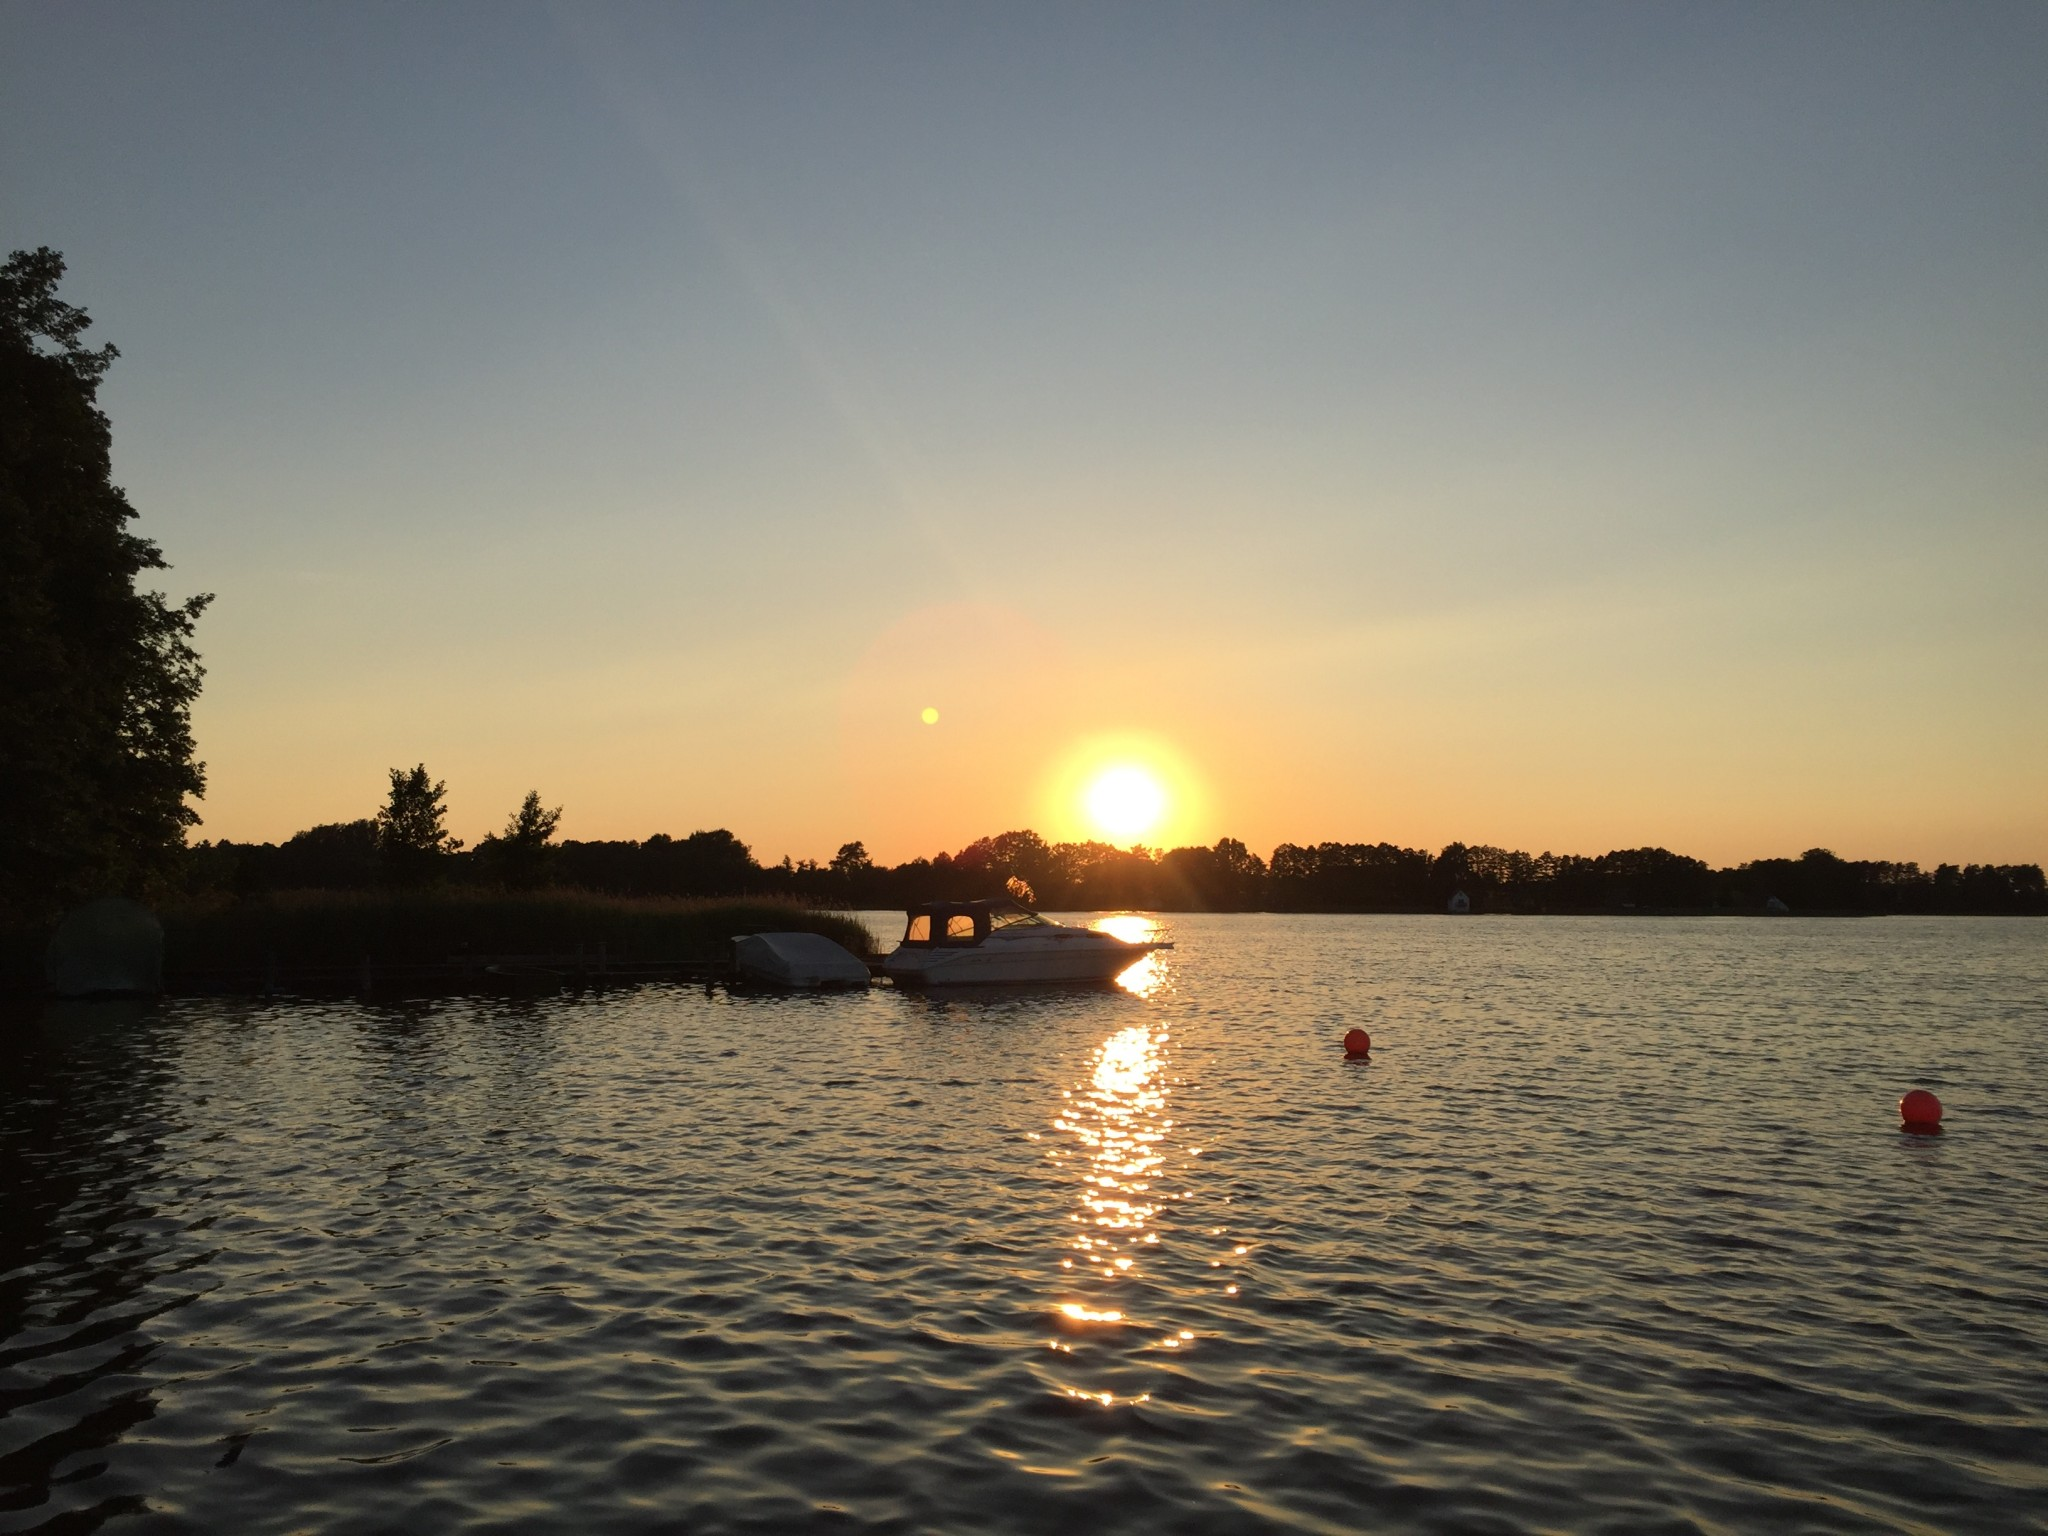 Sonnenuntergang Mecklenburgische Seenplatte Sommer 2016